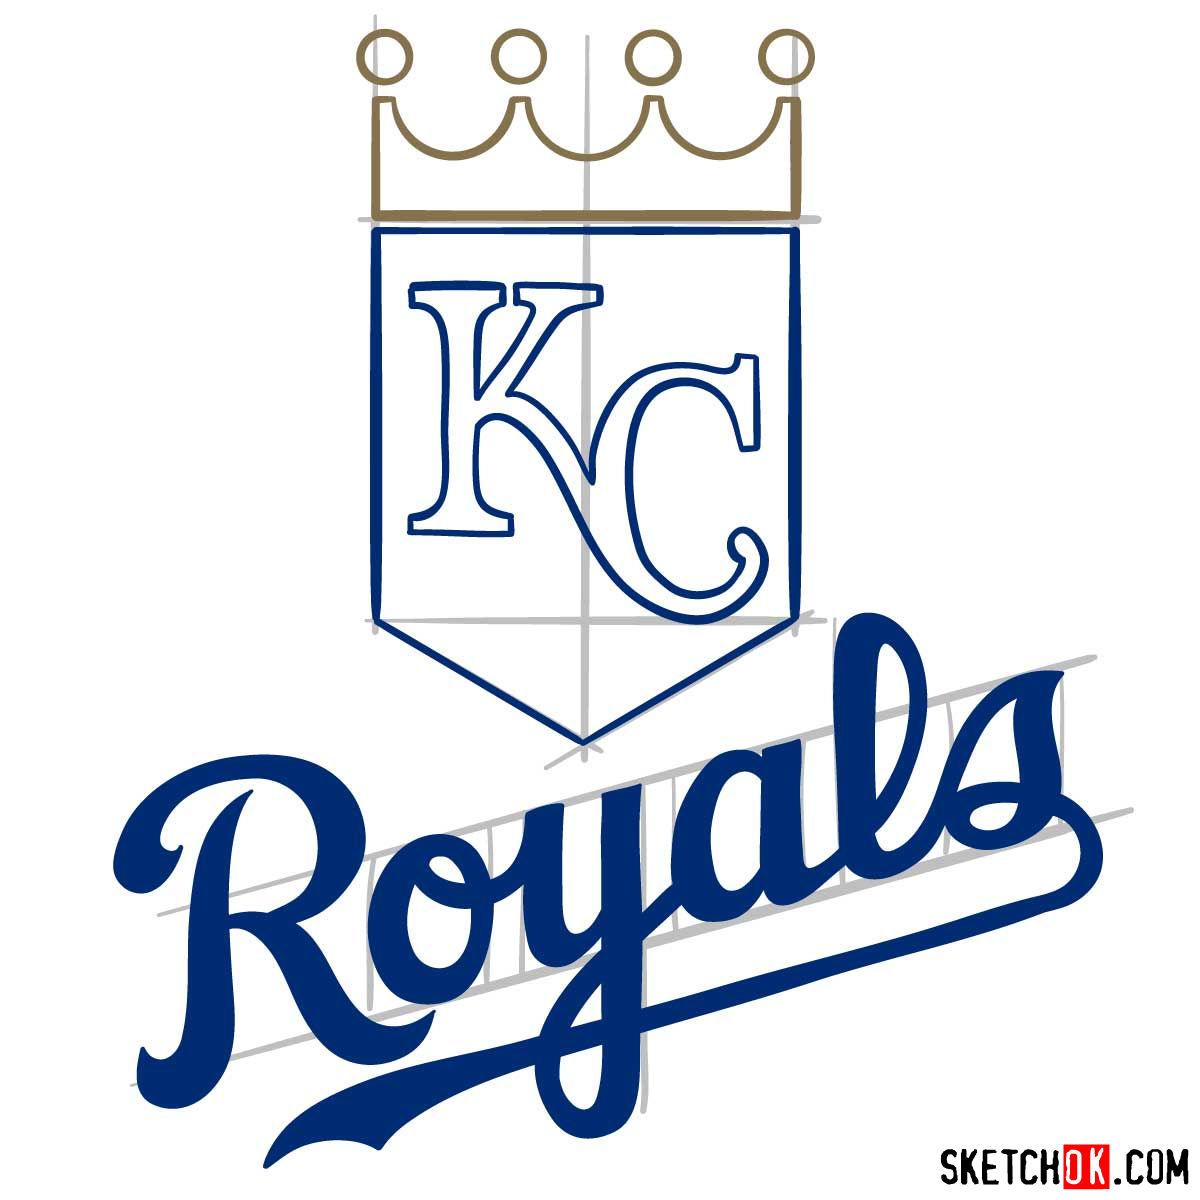 How to draw Kansas City Royals logo | MLB logos - step 08